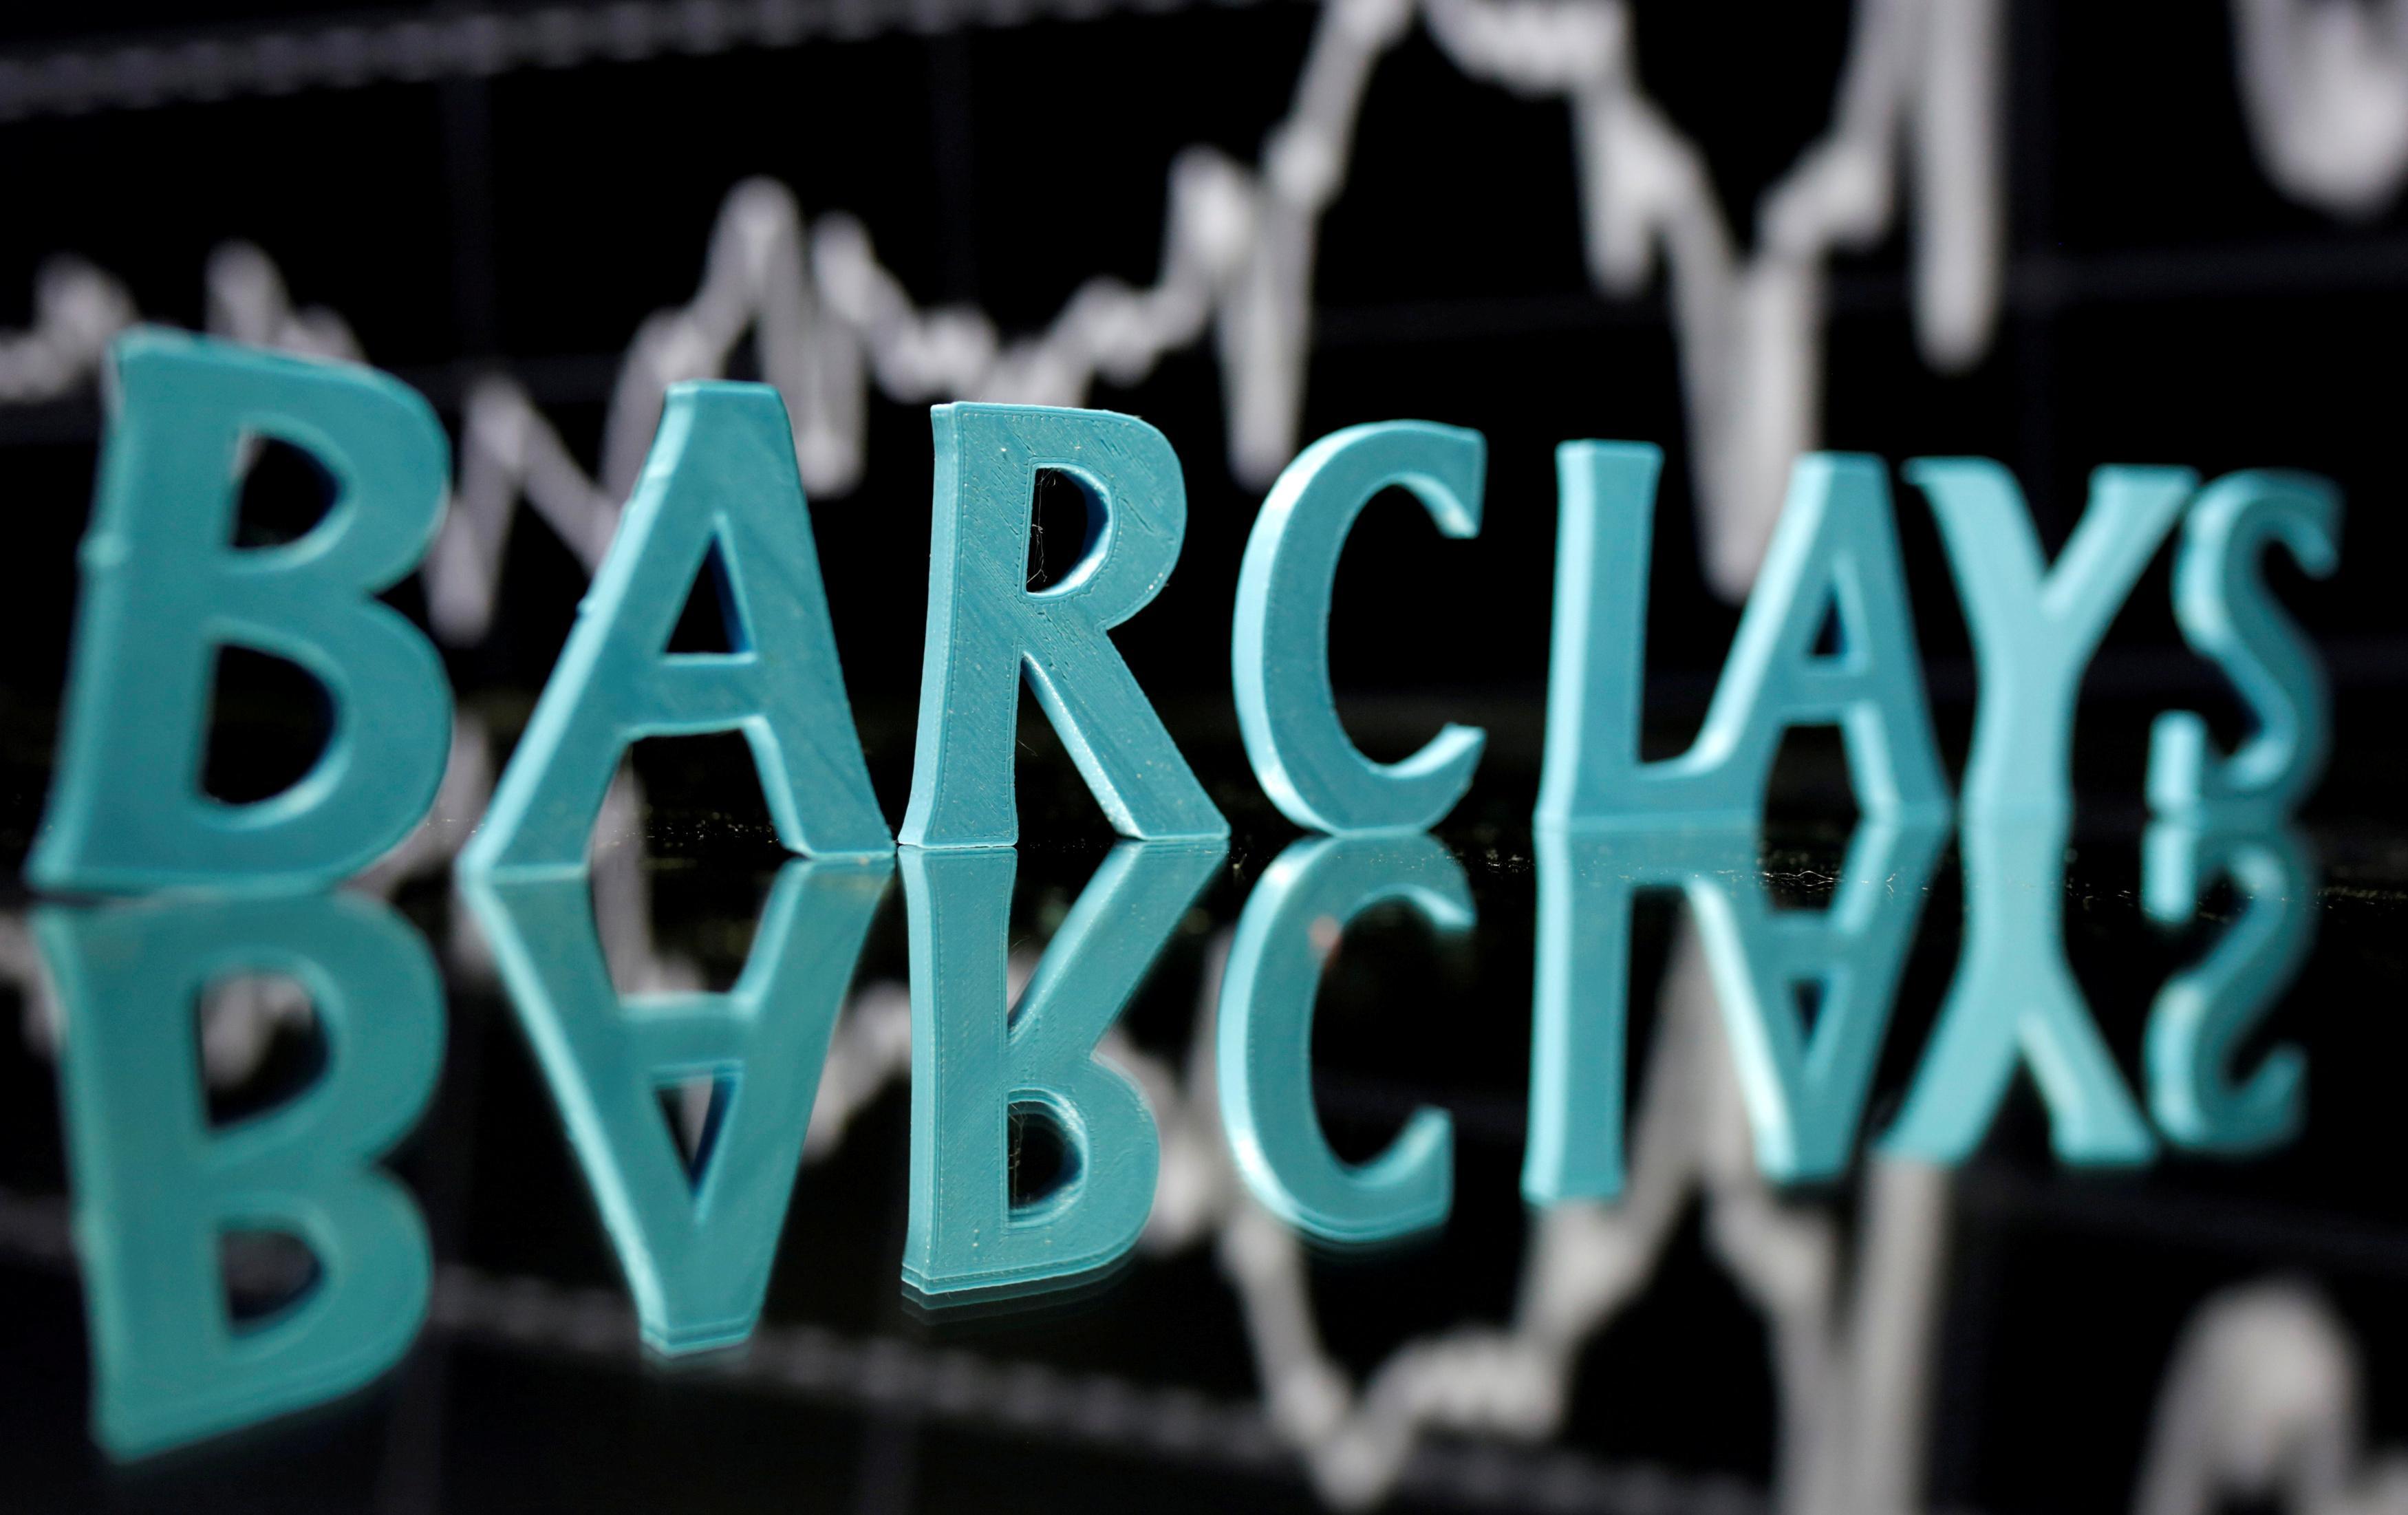 London judge discharges jury in landmark Barclays Qatar case